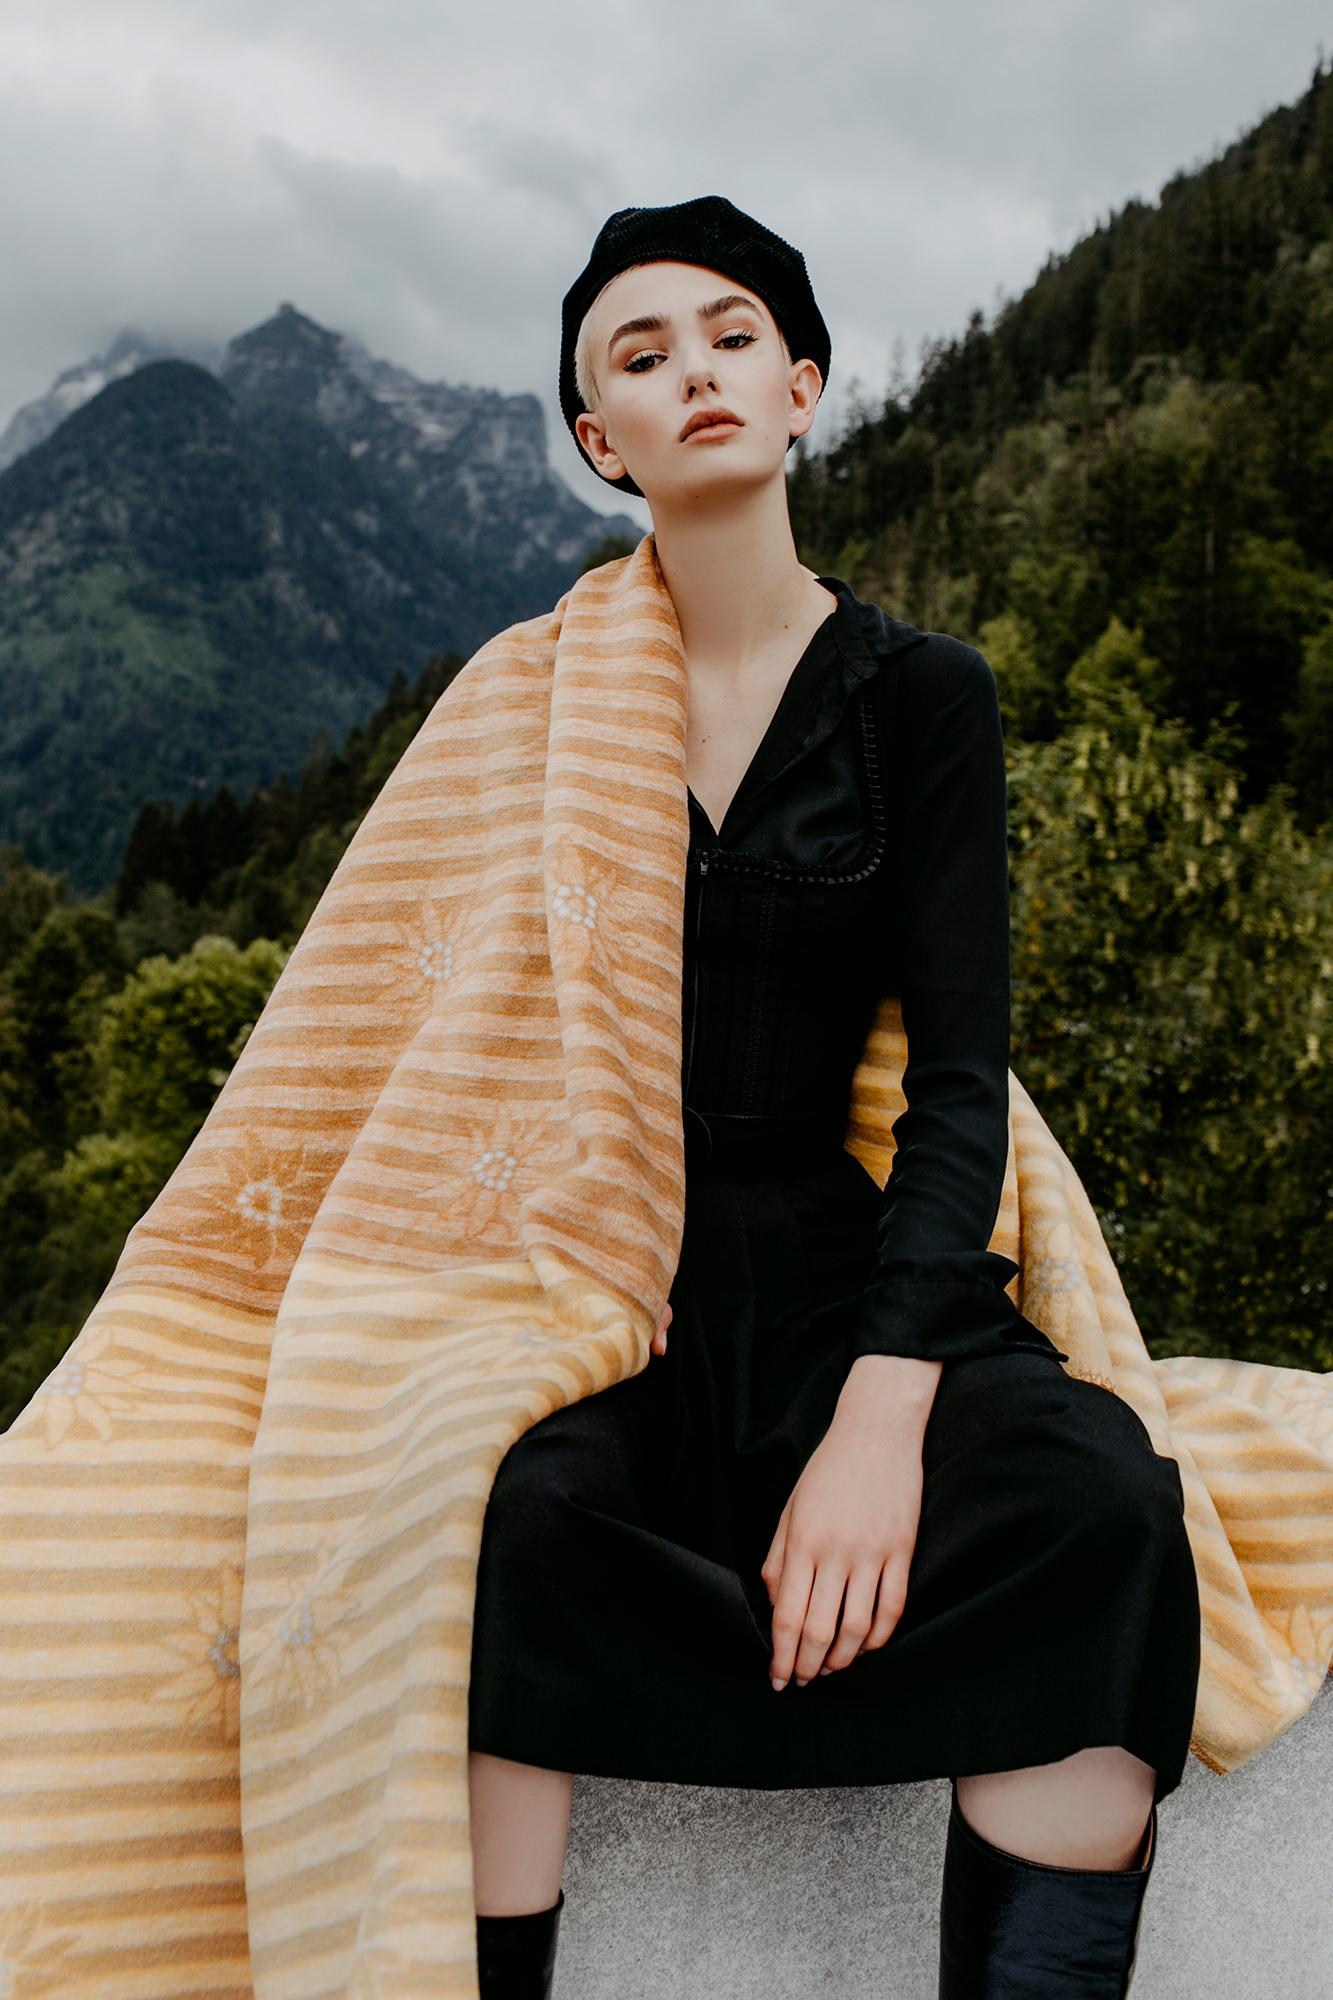 Muenchen-Fashion-Fotograf-Fashionfotografie-Anna-Fichtner-N2